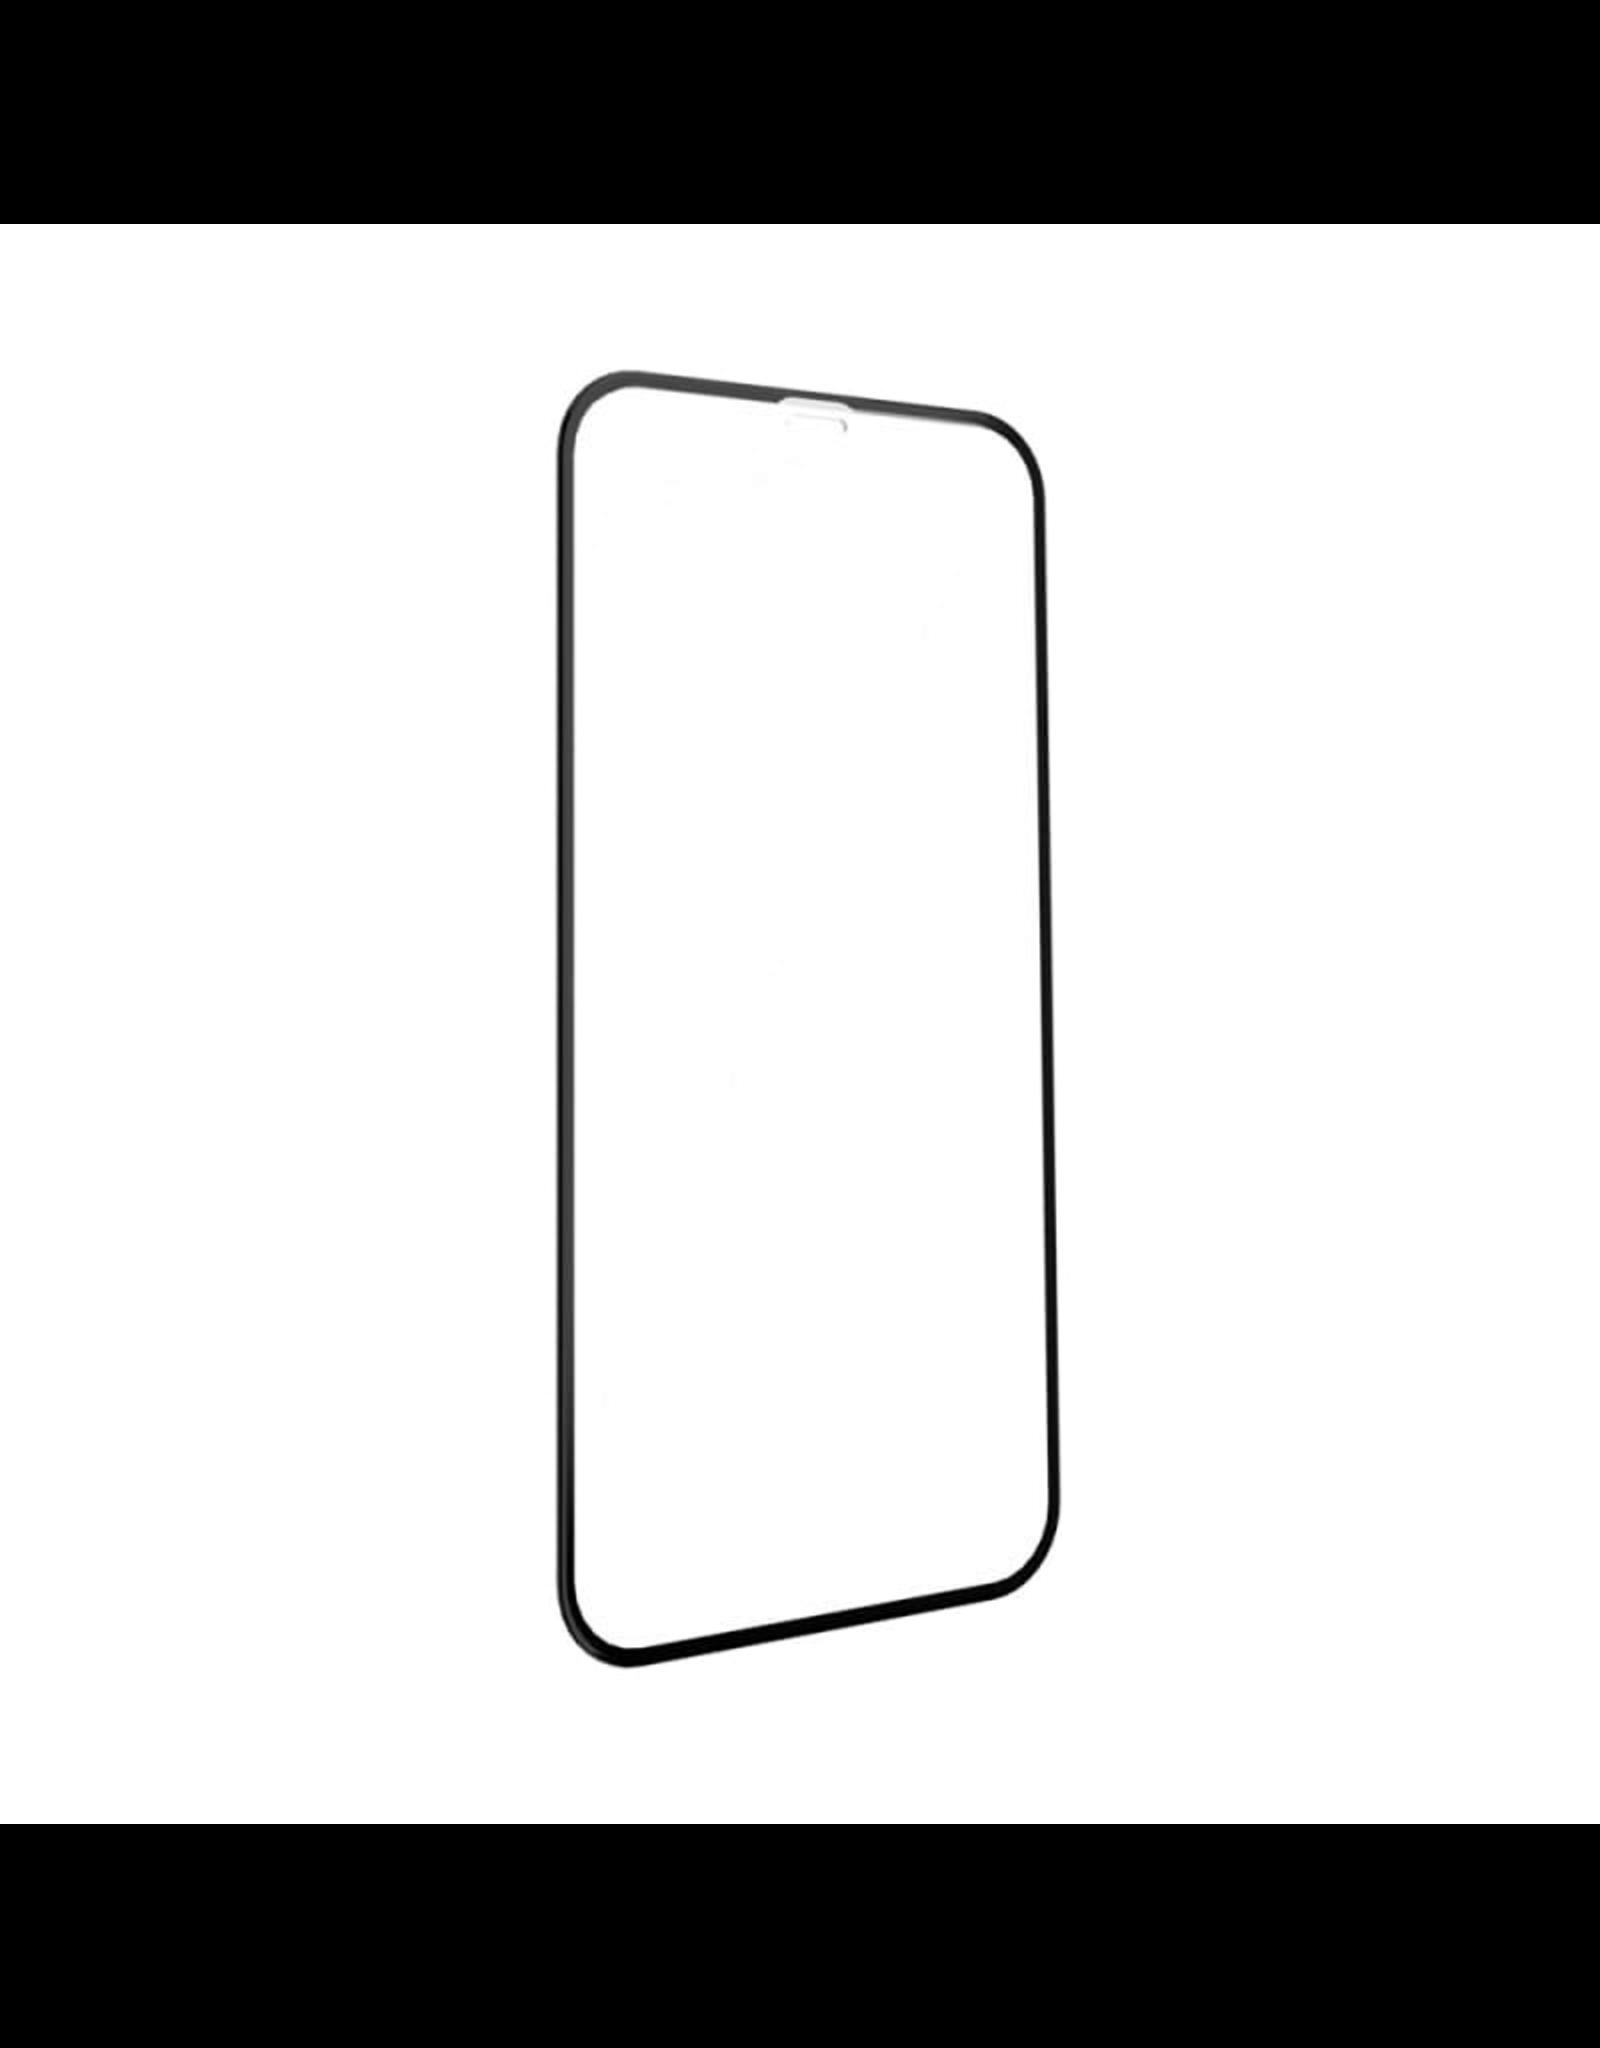 EFM EFM Impact Glass iPhone XR/11 Screen Armour Display Optimised - Clear/Black Frame